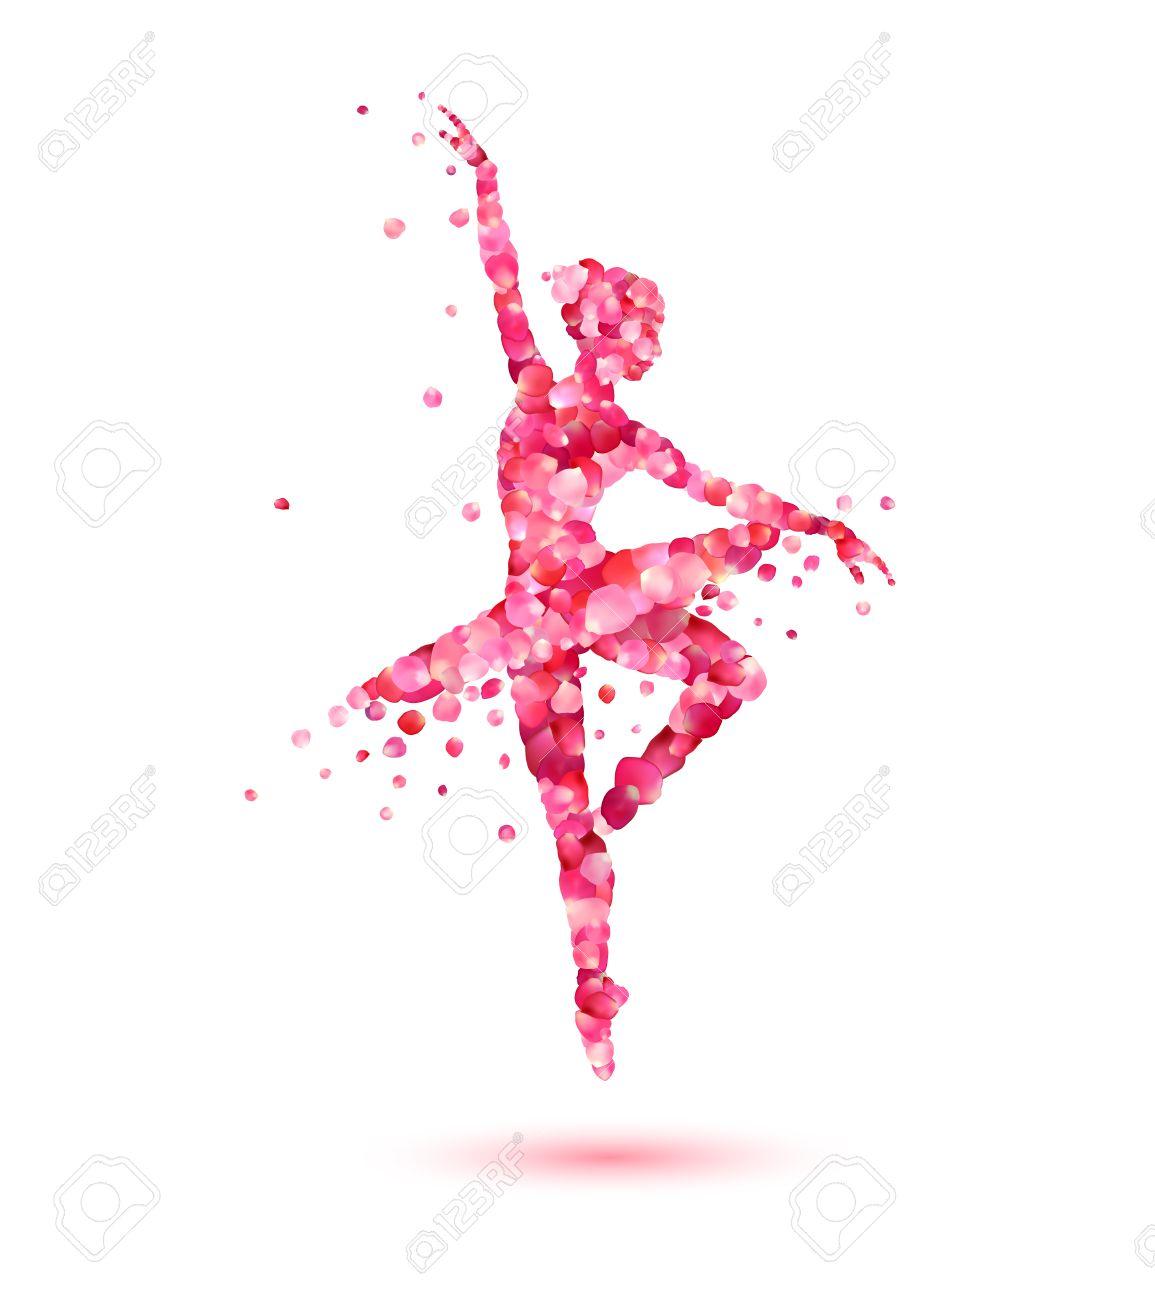 Bailarina De La Silueta Del Vector De Color Rosa Pétalos De Rosa ...